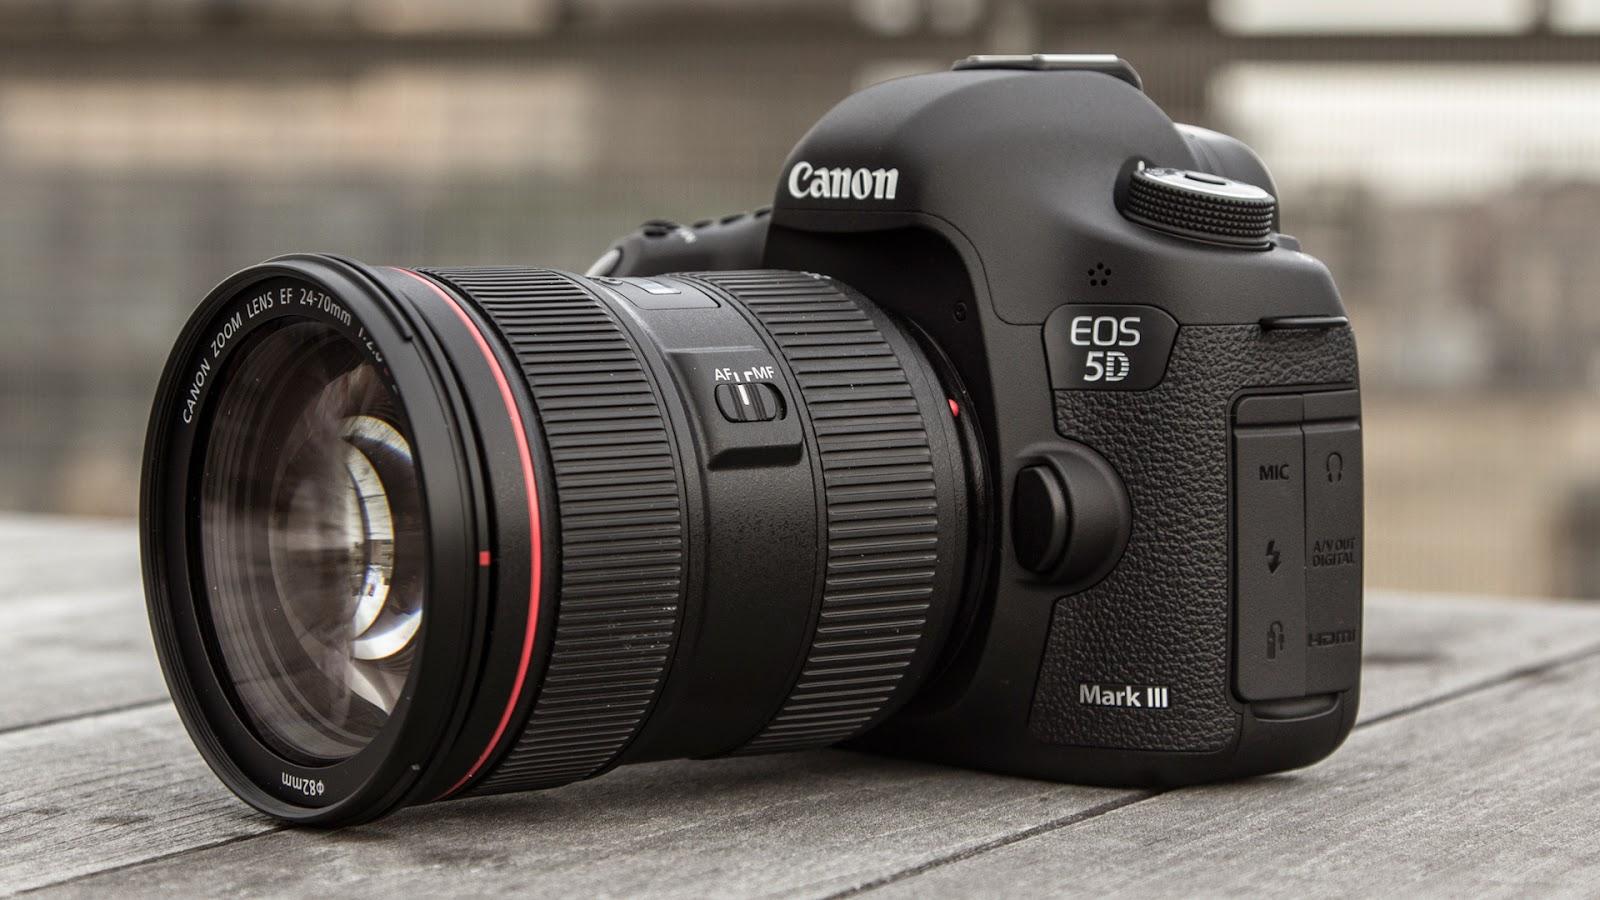 كاميرا كانون Canon EOS 5D Mark III